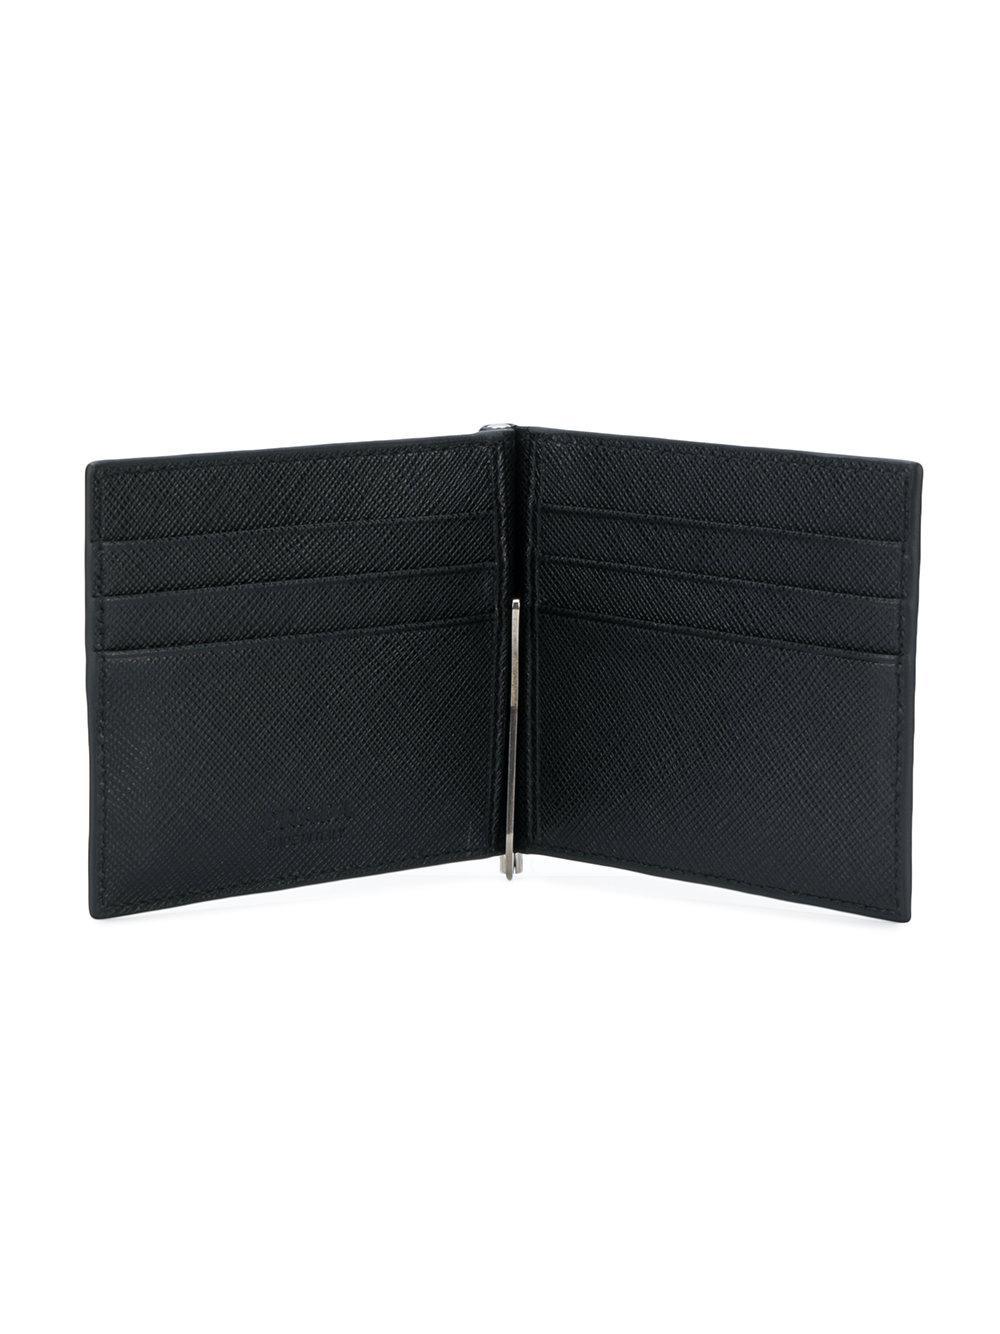 440918493be156 closeout lyst prada saffiano contrast corner bi fold wallet in black for  men e4d51 f72ee